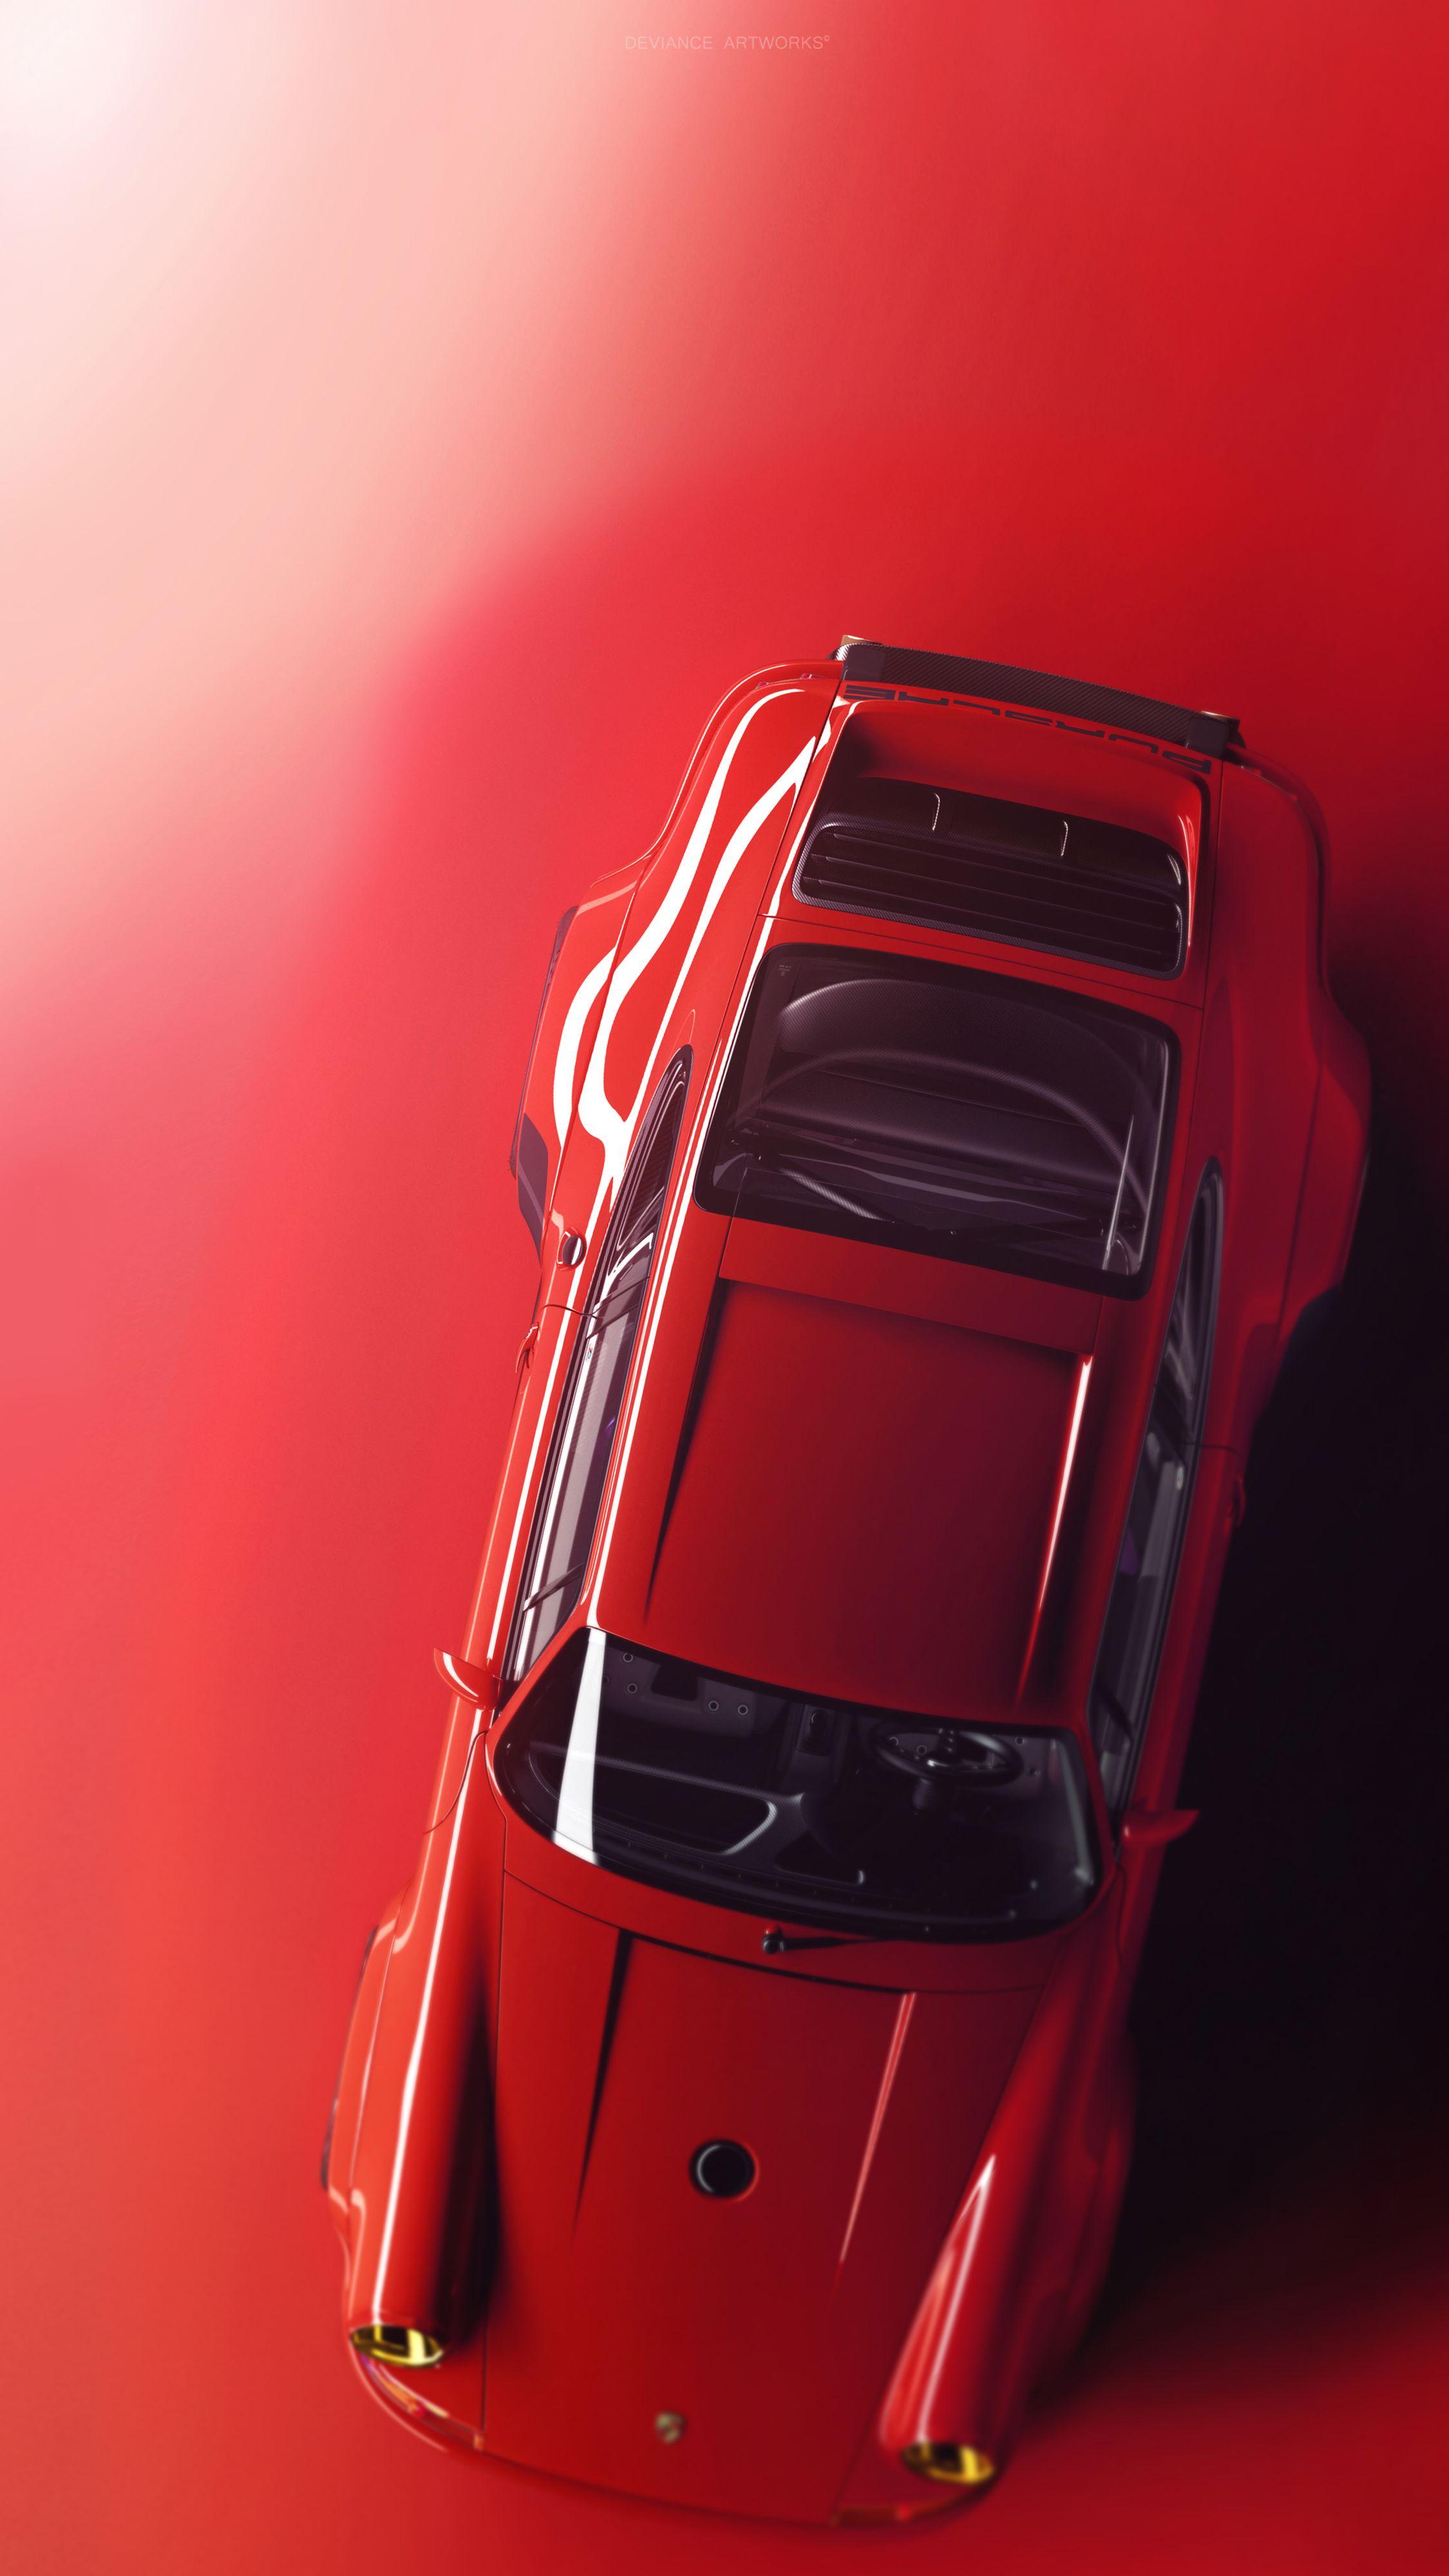 A Colors Story Singer Dls On Behance Singer Porsche Porsche Cars Classic Porsche Porsche cars hd red behance images